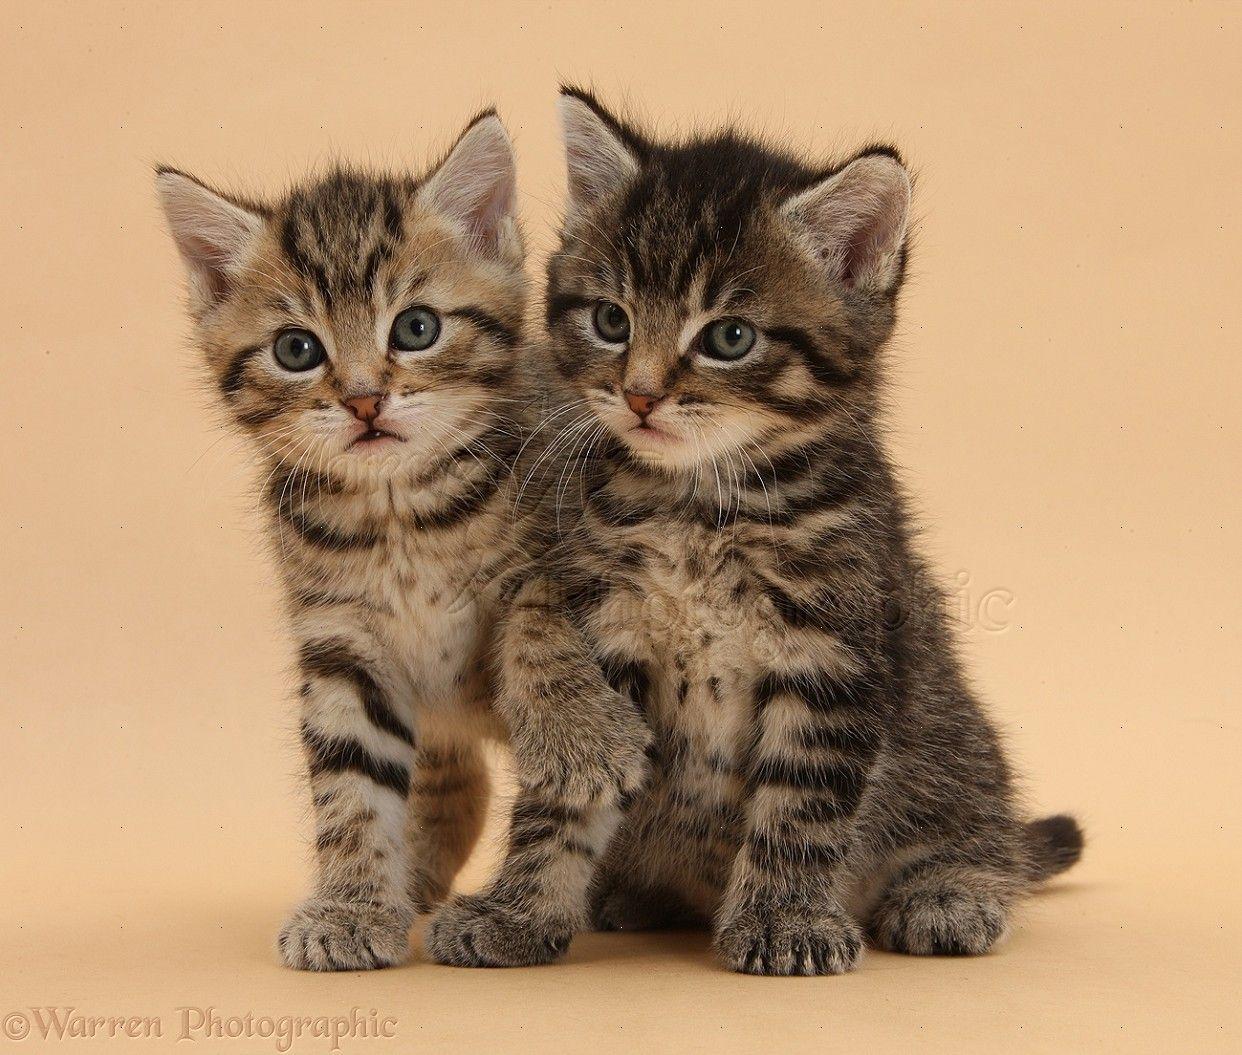 Cute Tabby Kitten below for more cute cats